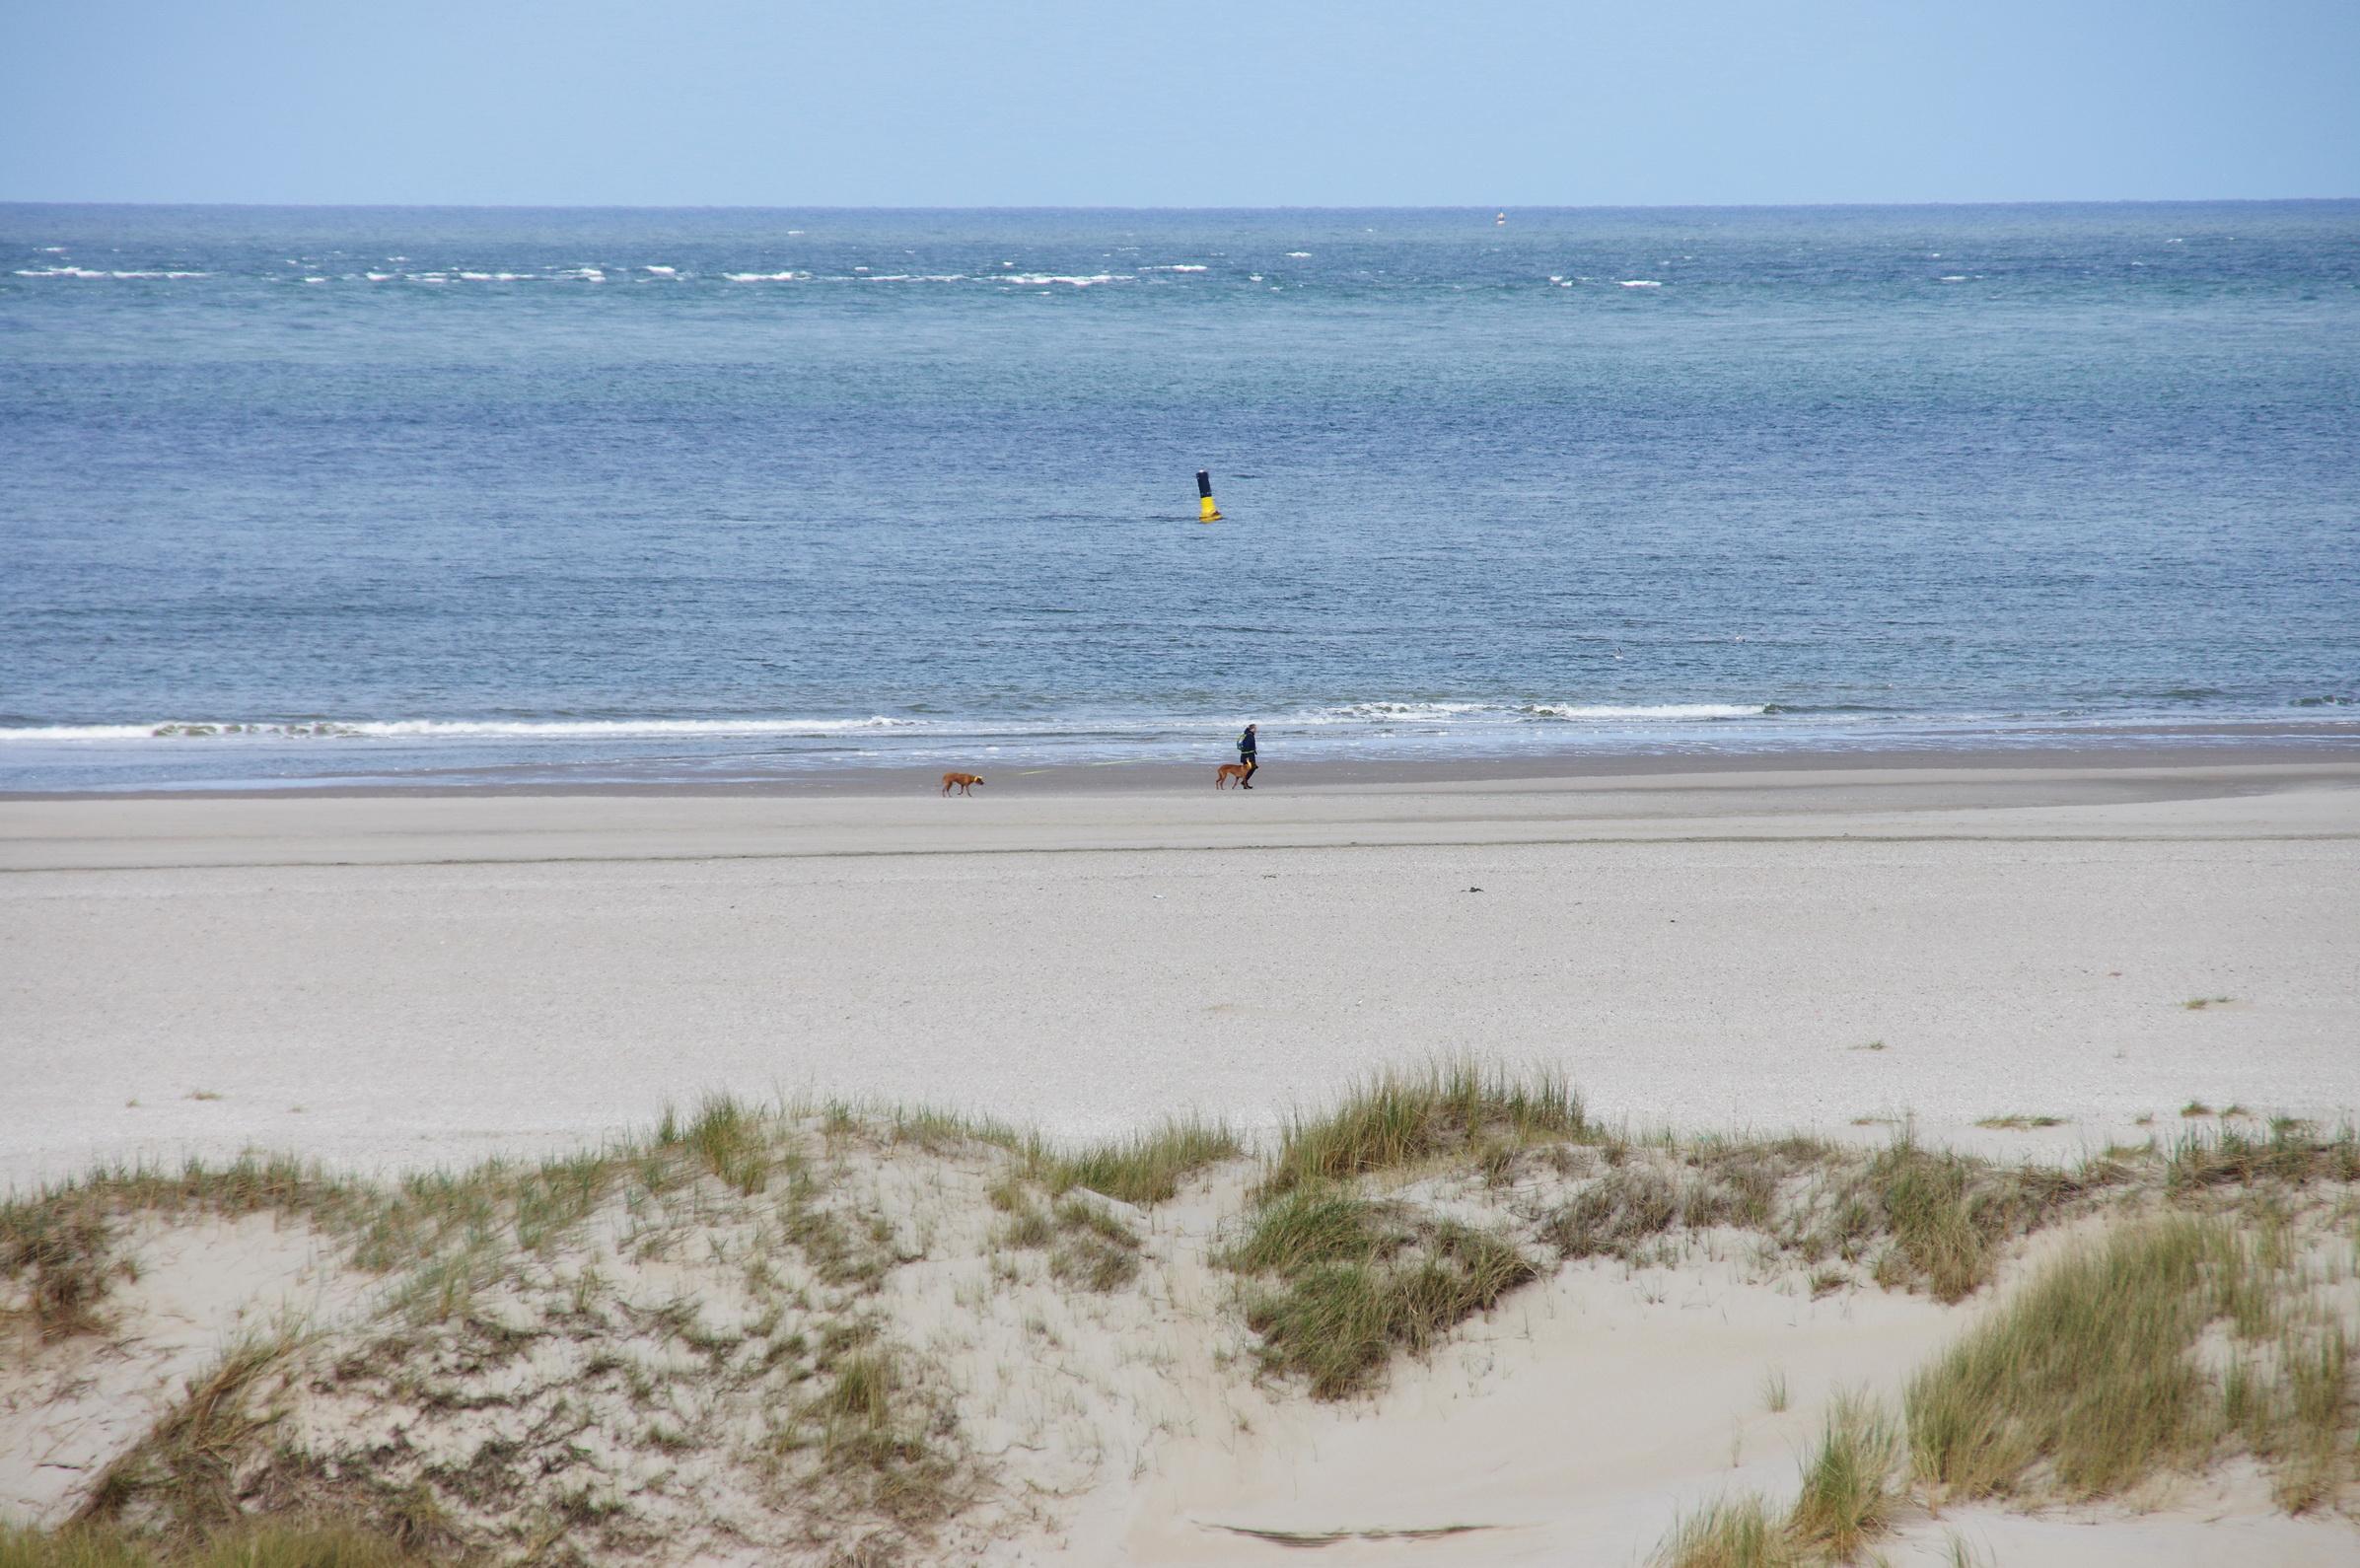 Texel - Strandspaziergang Leuchtturm TH 5